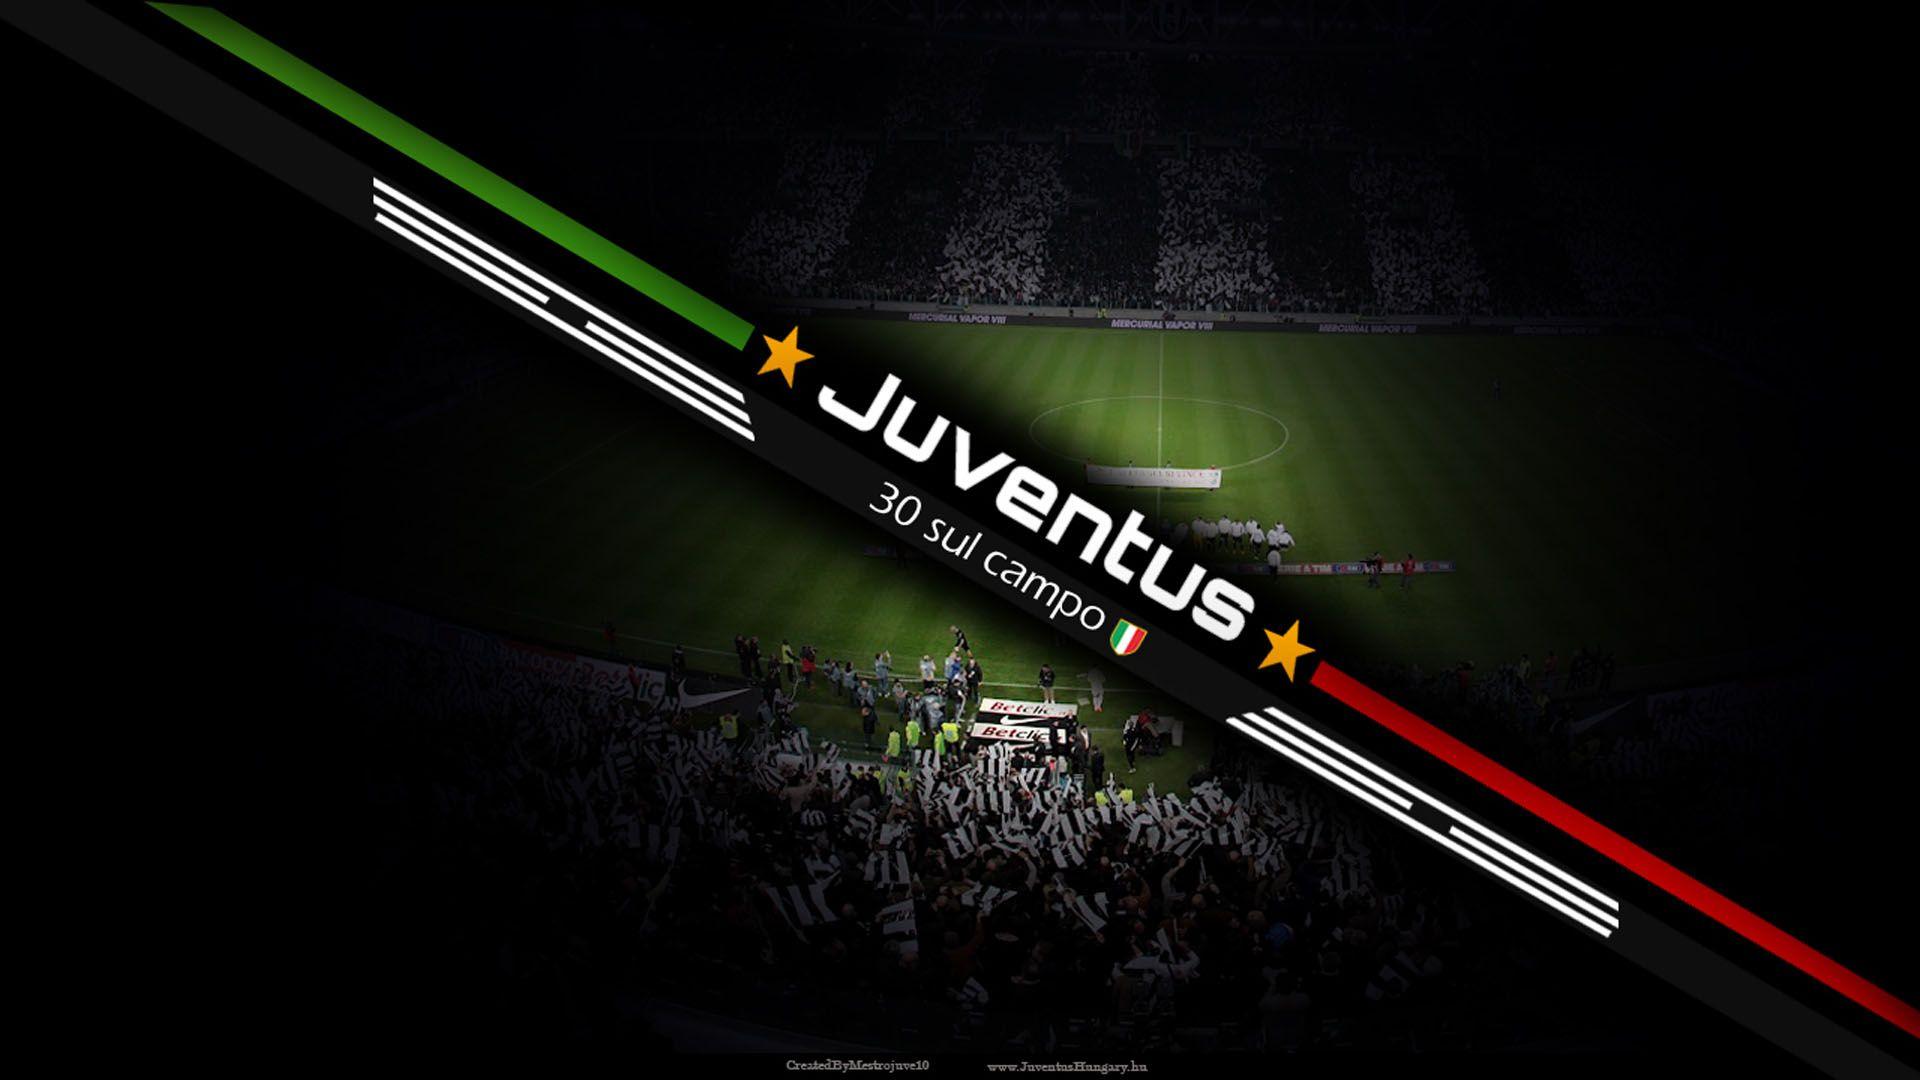 80 Juventus Hd Wallpapers On Wallpaperplay In 2020 Juventus Wallpapers Juventus Ronaldo Juventus